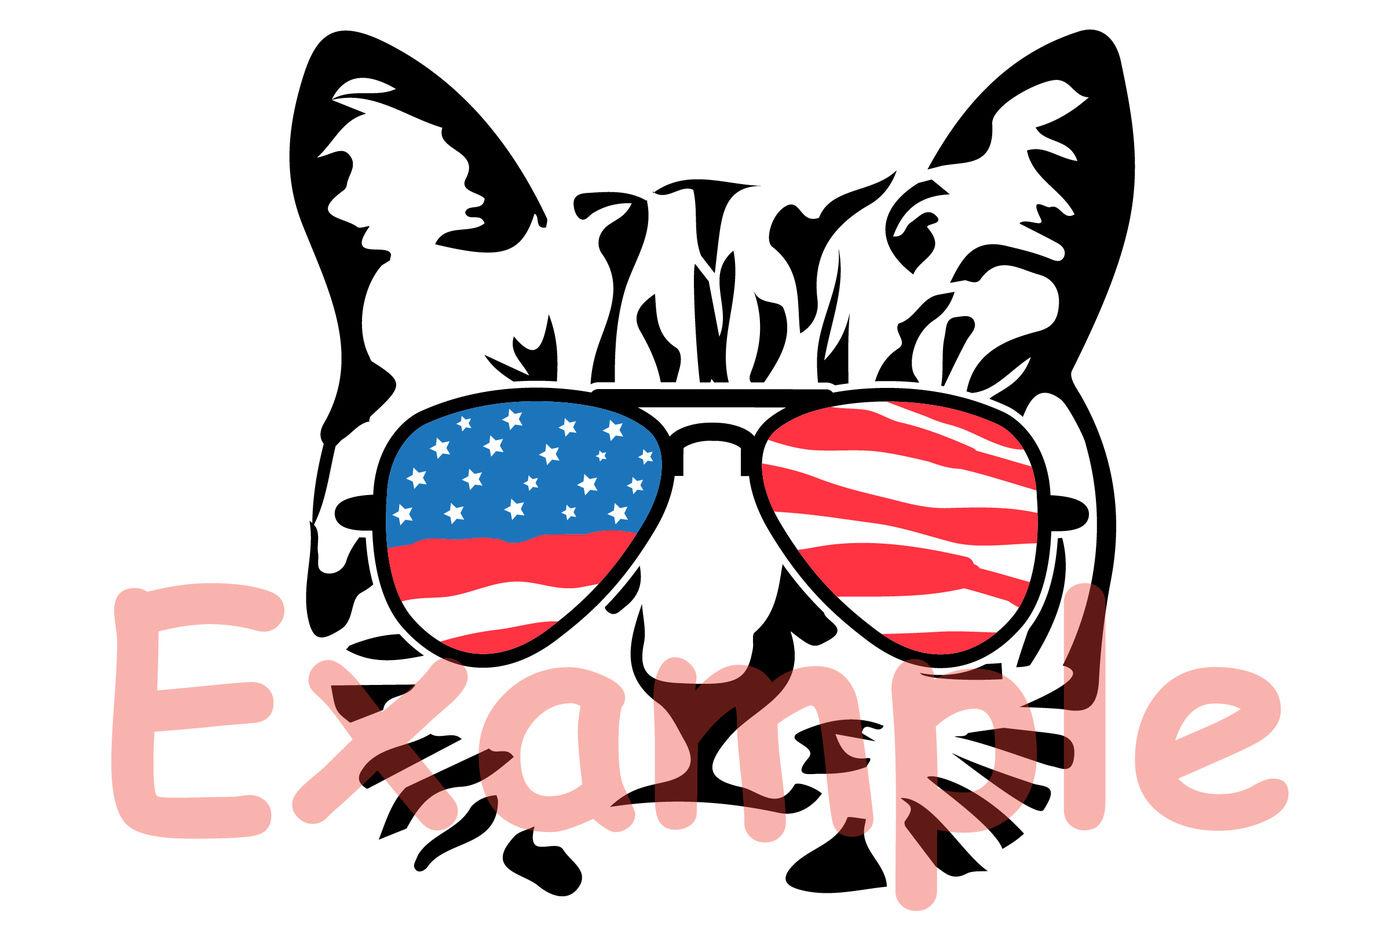 Cat Usa Flag Glasses Silhouette Svg Farm Kitten Kitty 4th July